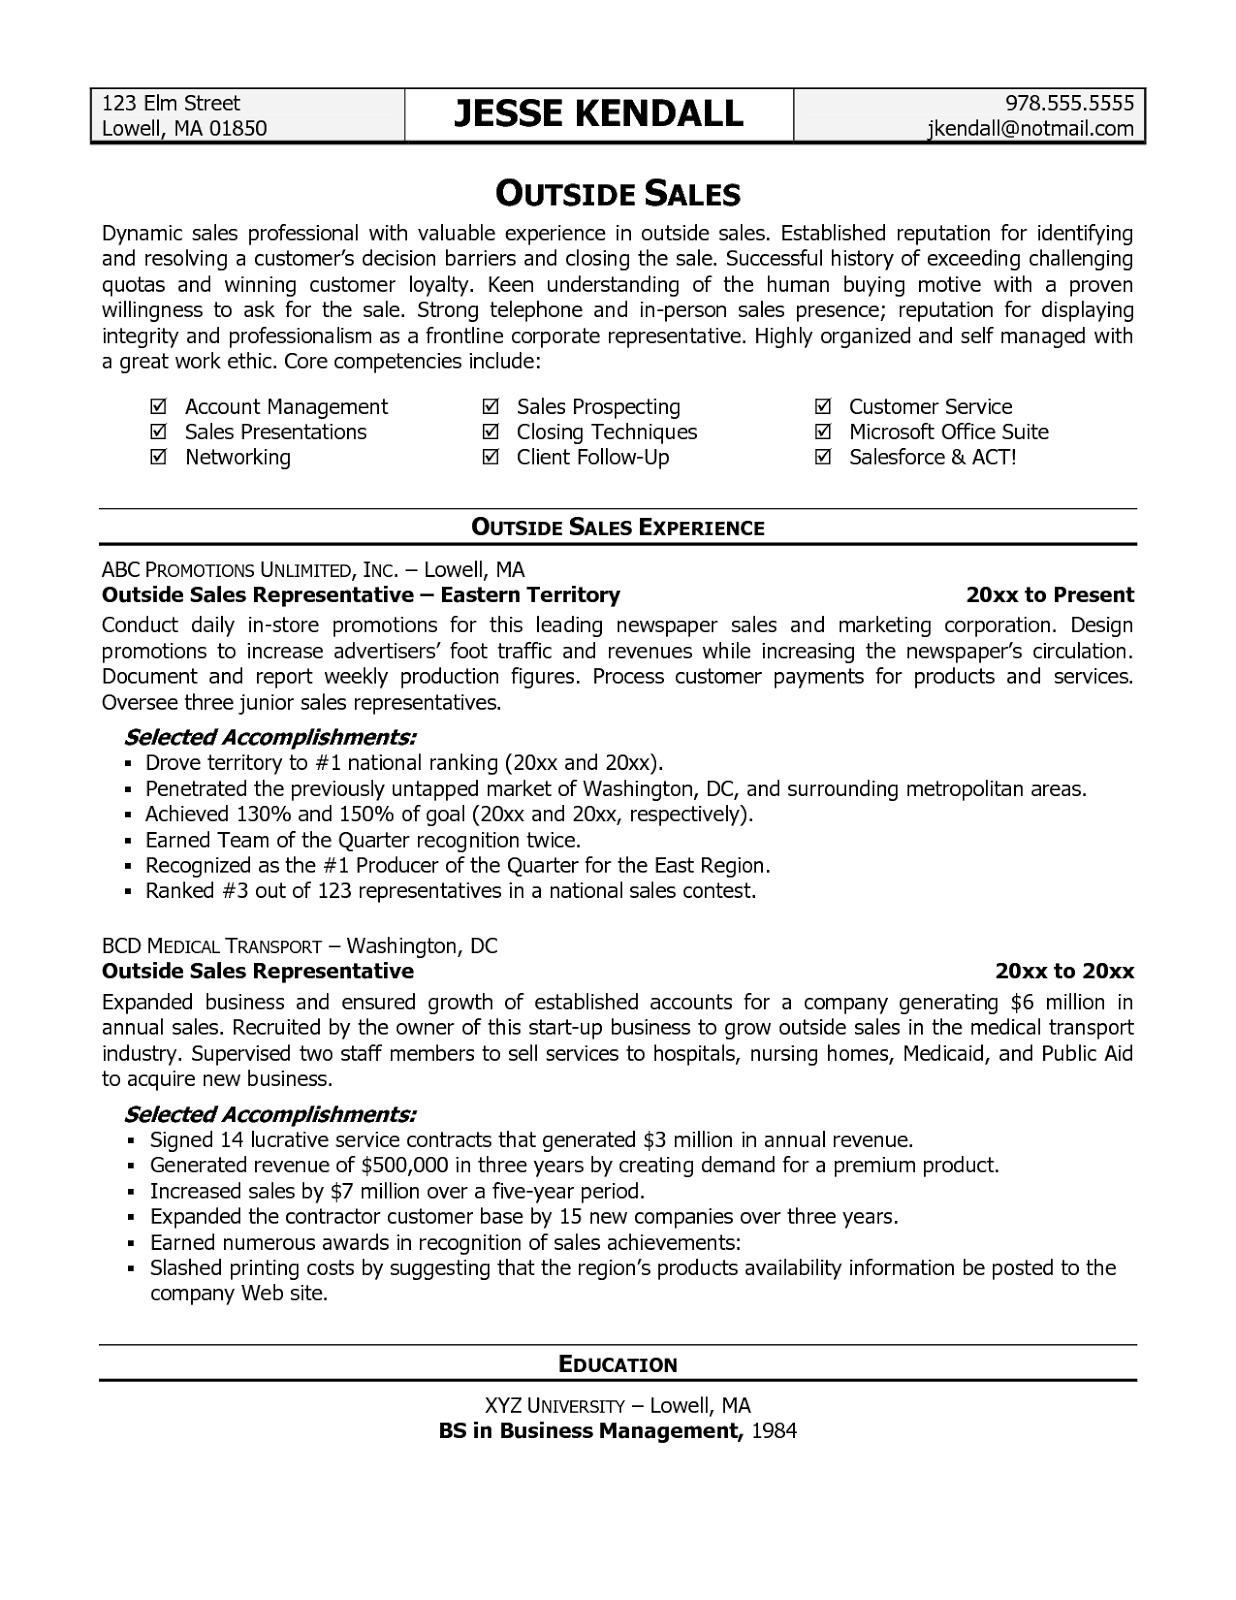 National Sales Manager Resume 27.05.2017